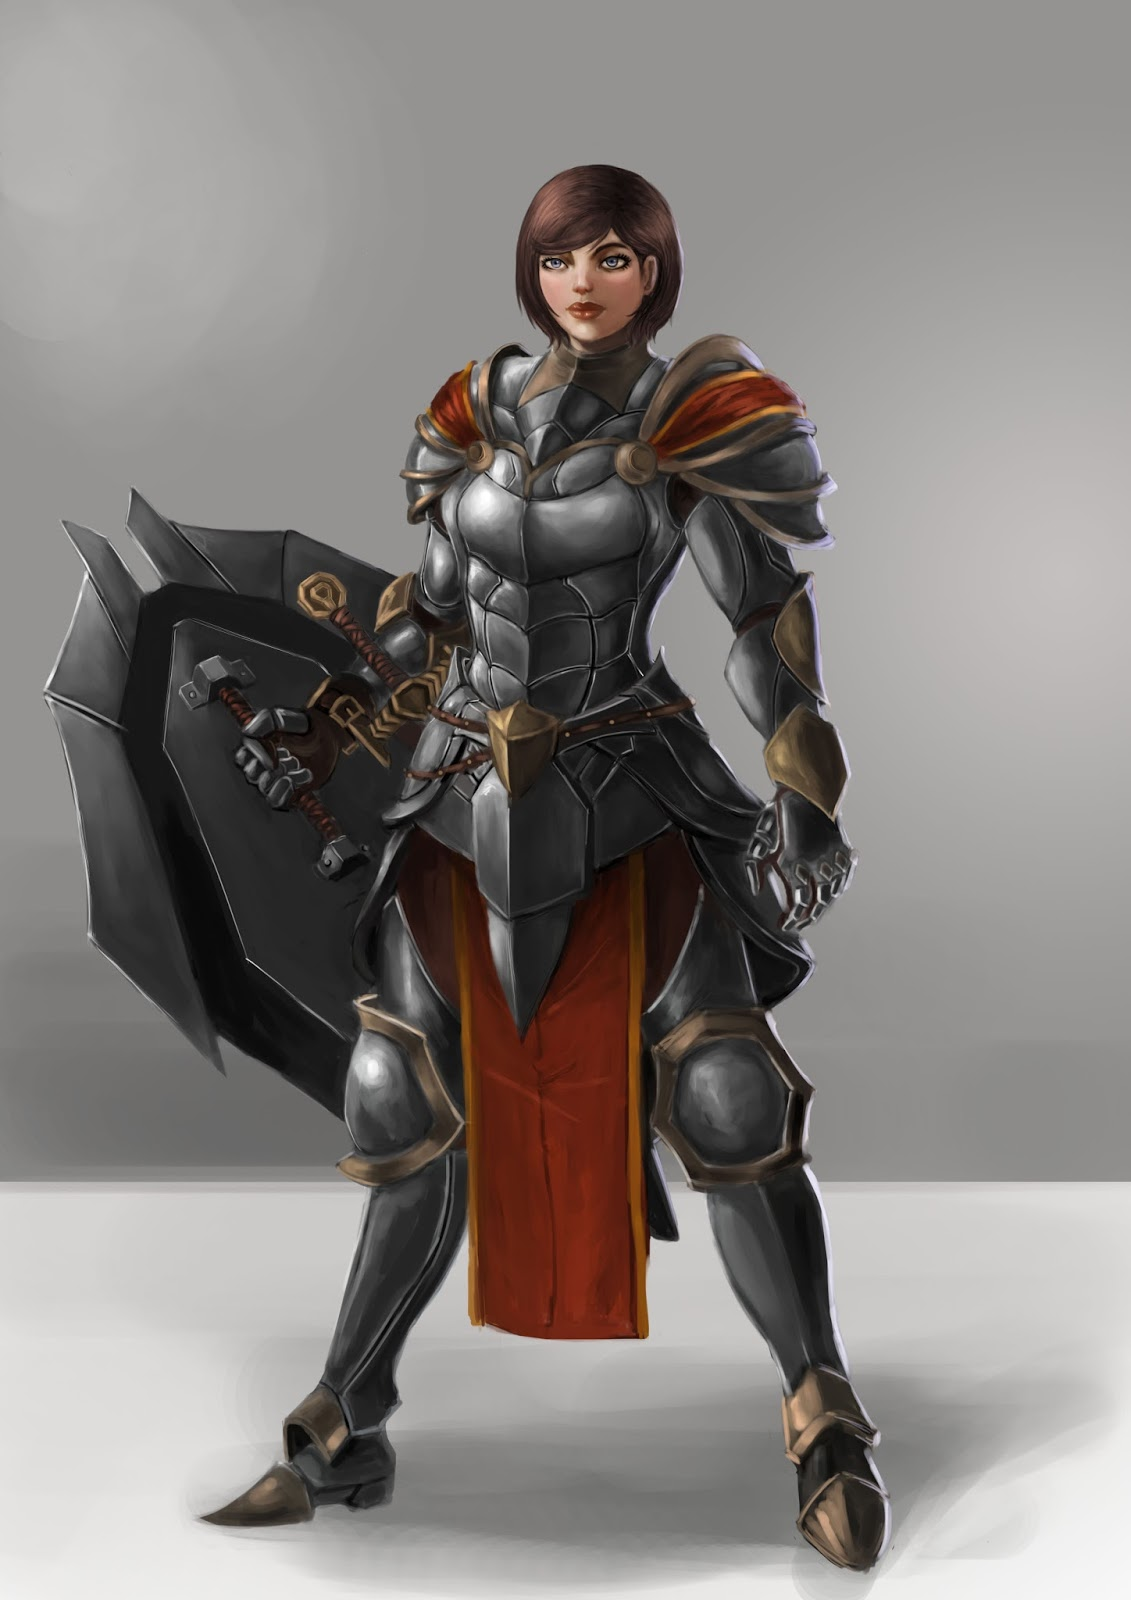 Lady+knight+copy.JPG